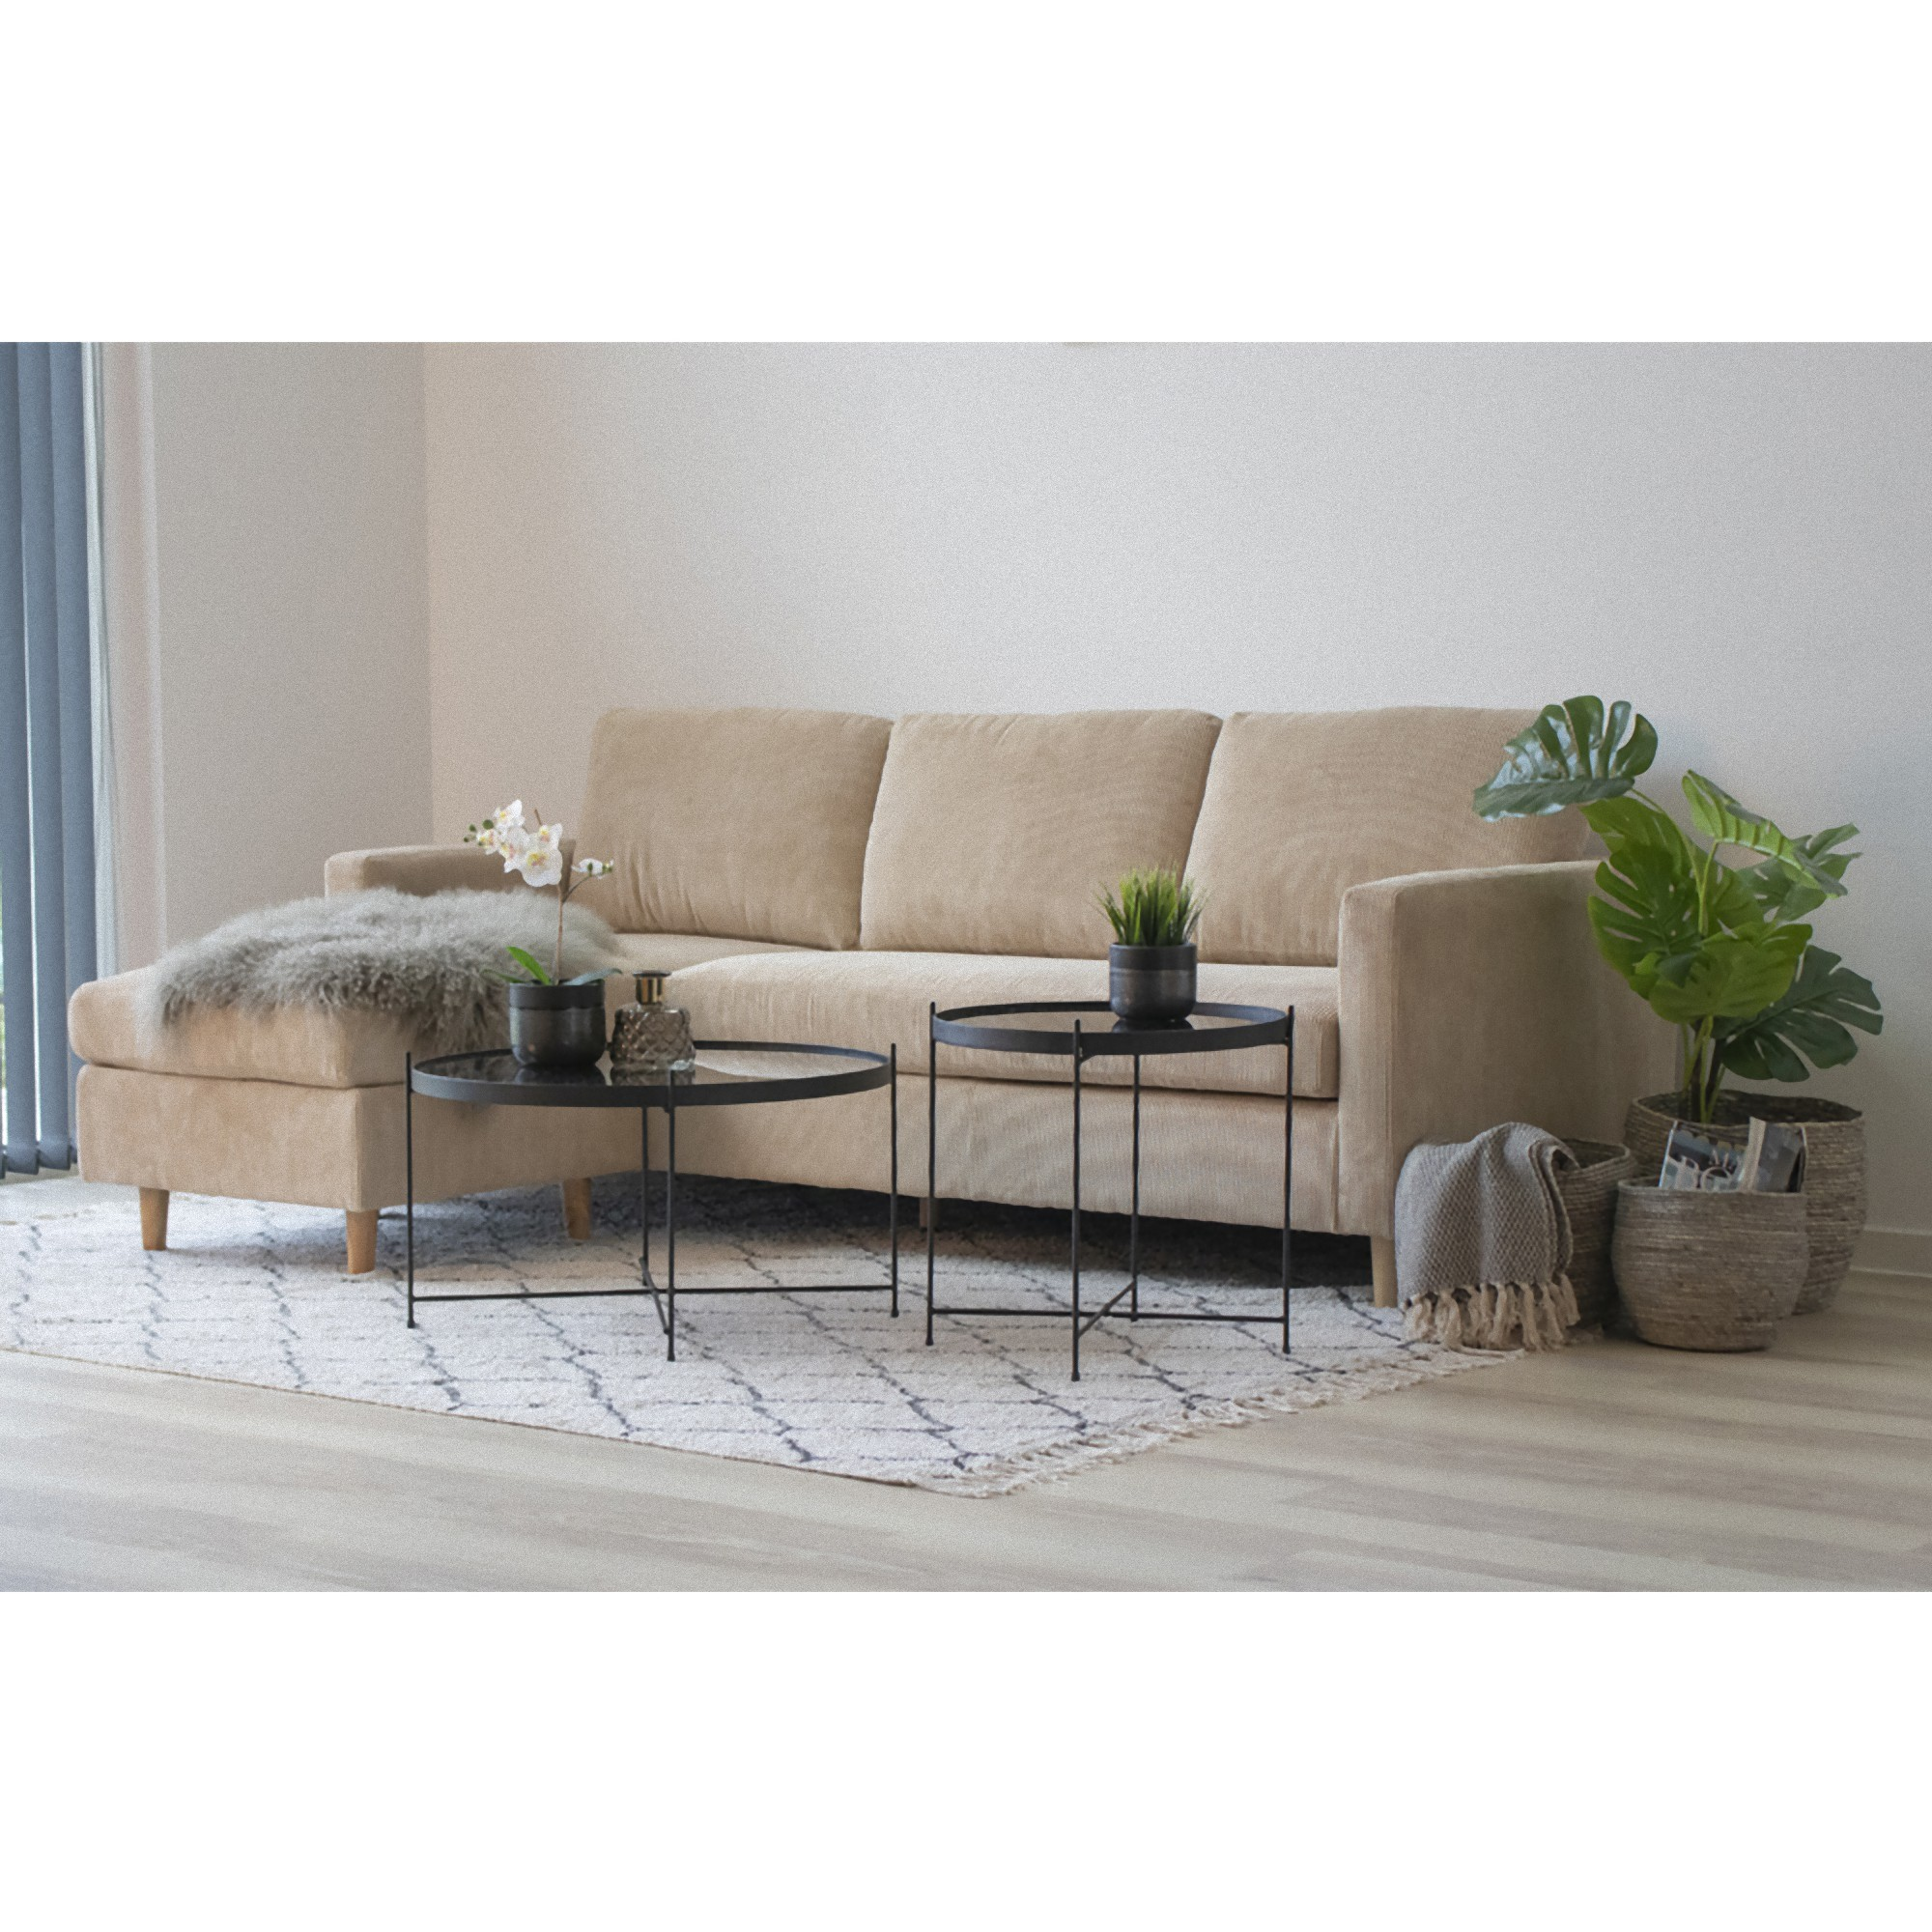 Full Size of Couch Garnitur Leder Sofa Garnituren 3 2 3 2 1 Rundecke 2 Teilig Mars Sandfarben Polstersofa Stoffrosa Lounge Günstiges Xora Antik Xxxl Tom Tailor Xxl Grau Sofa Sofa Garnitur